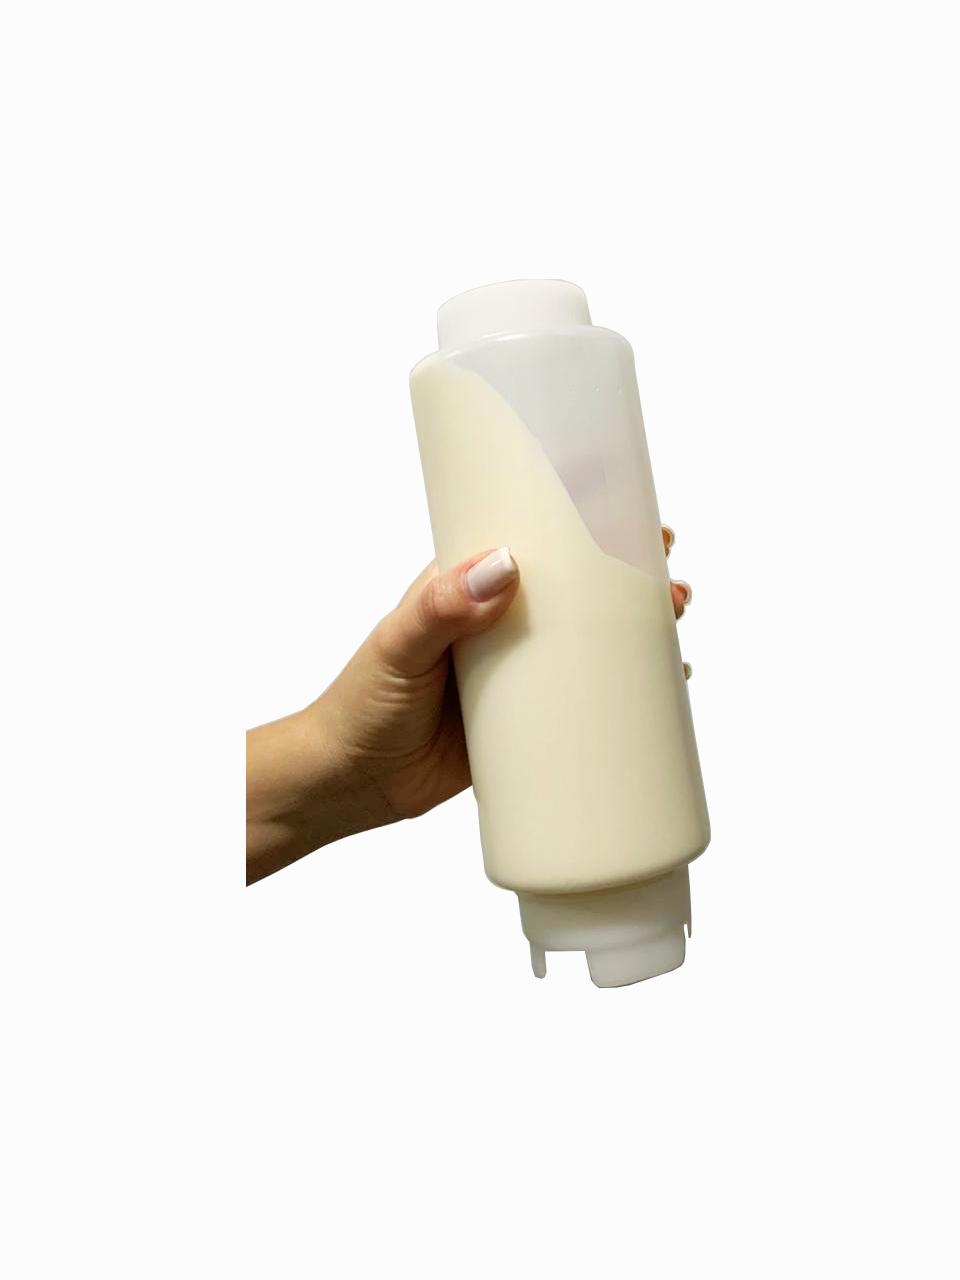 3 Bisnaga Invertida 720ml  - EKENOX- Equipamentos Industriais